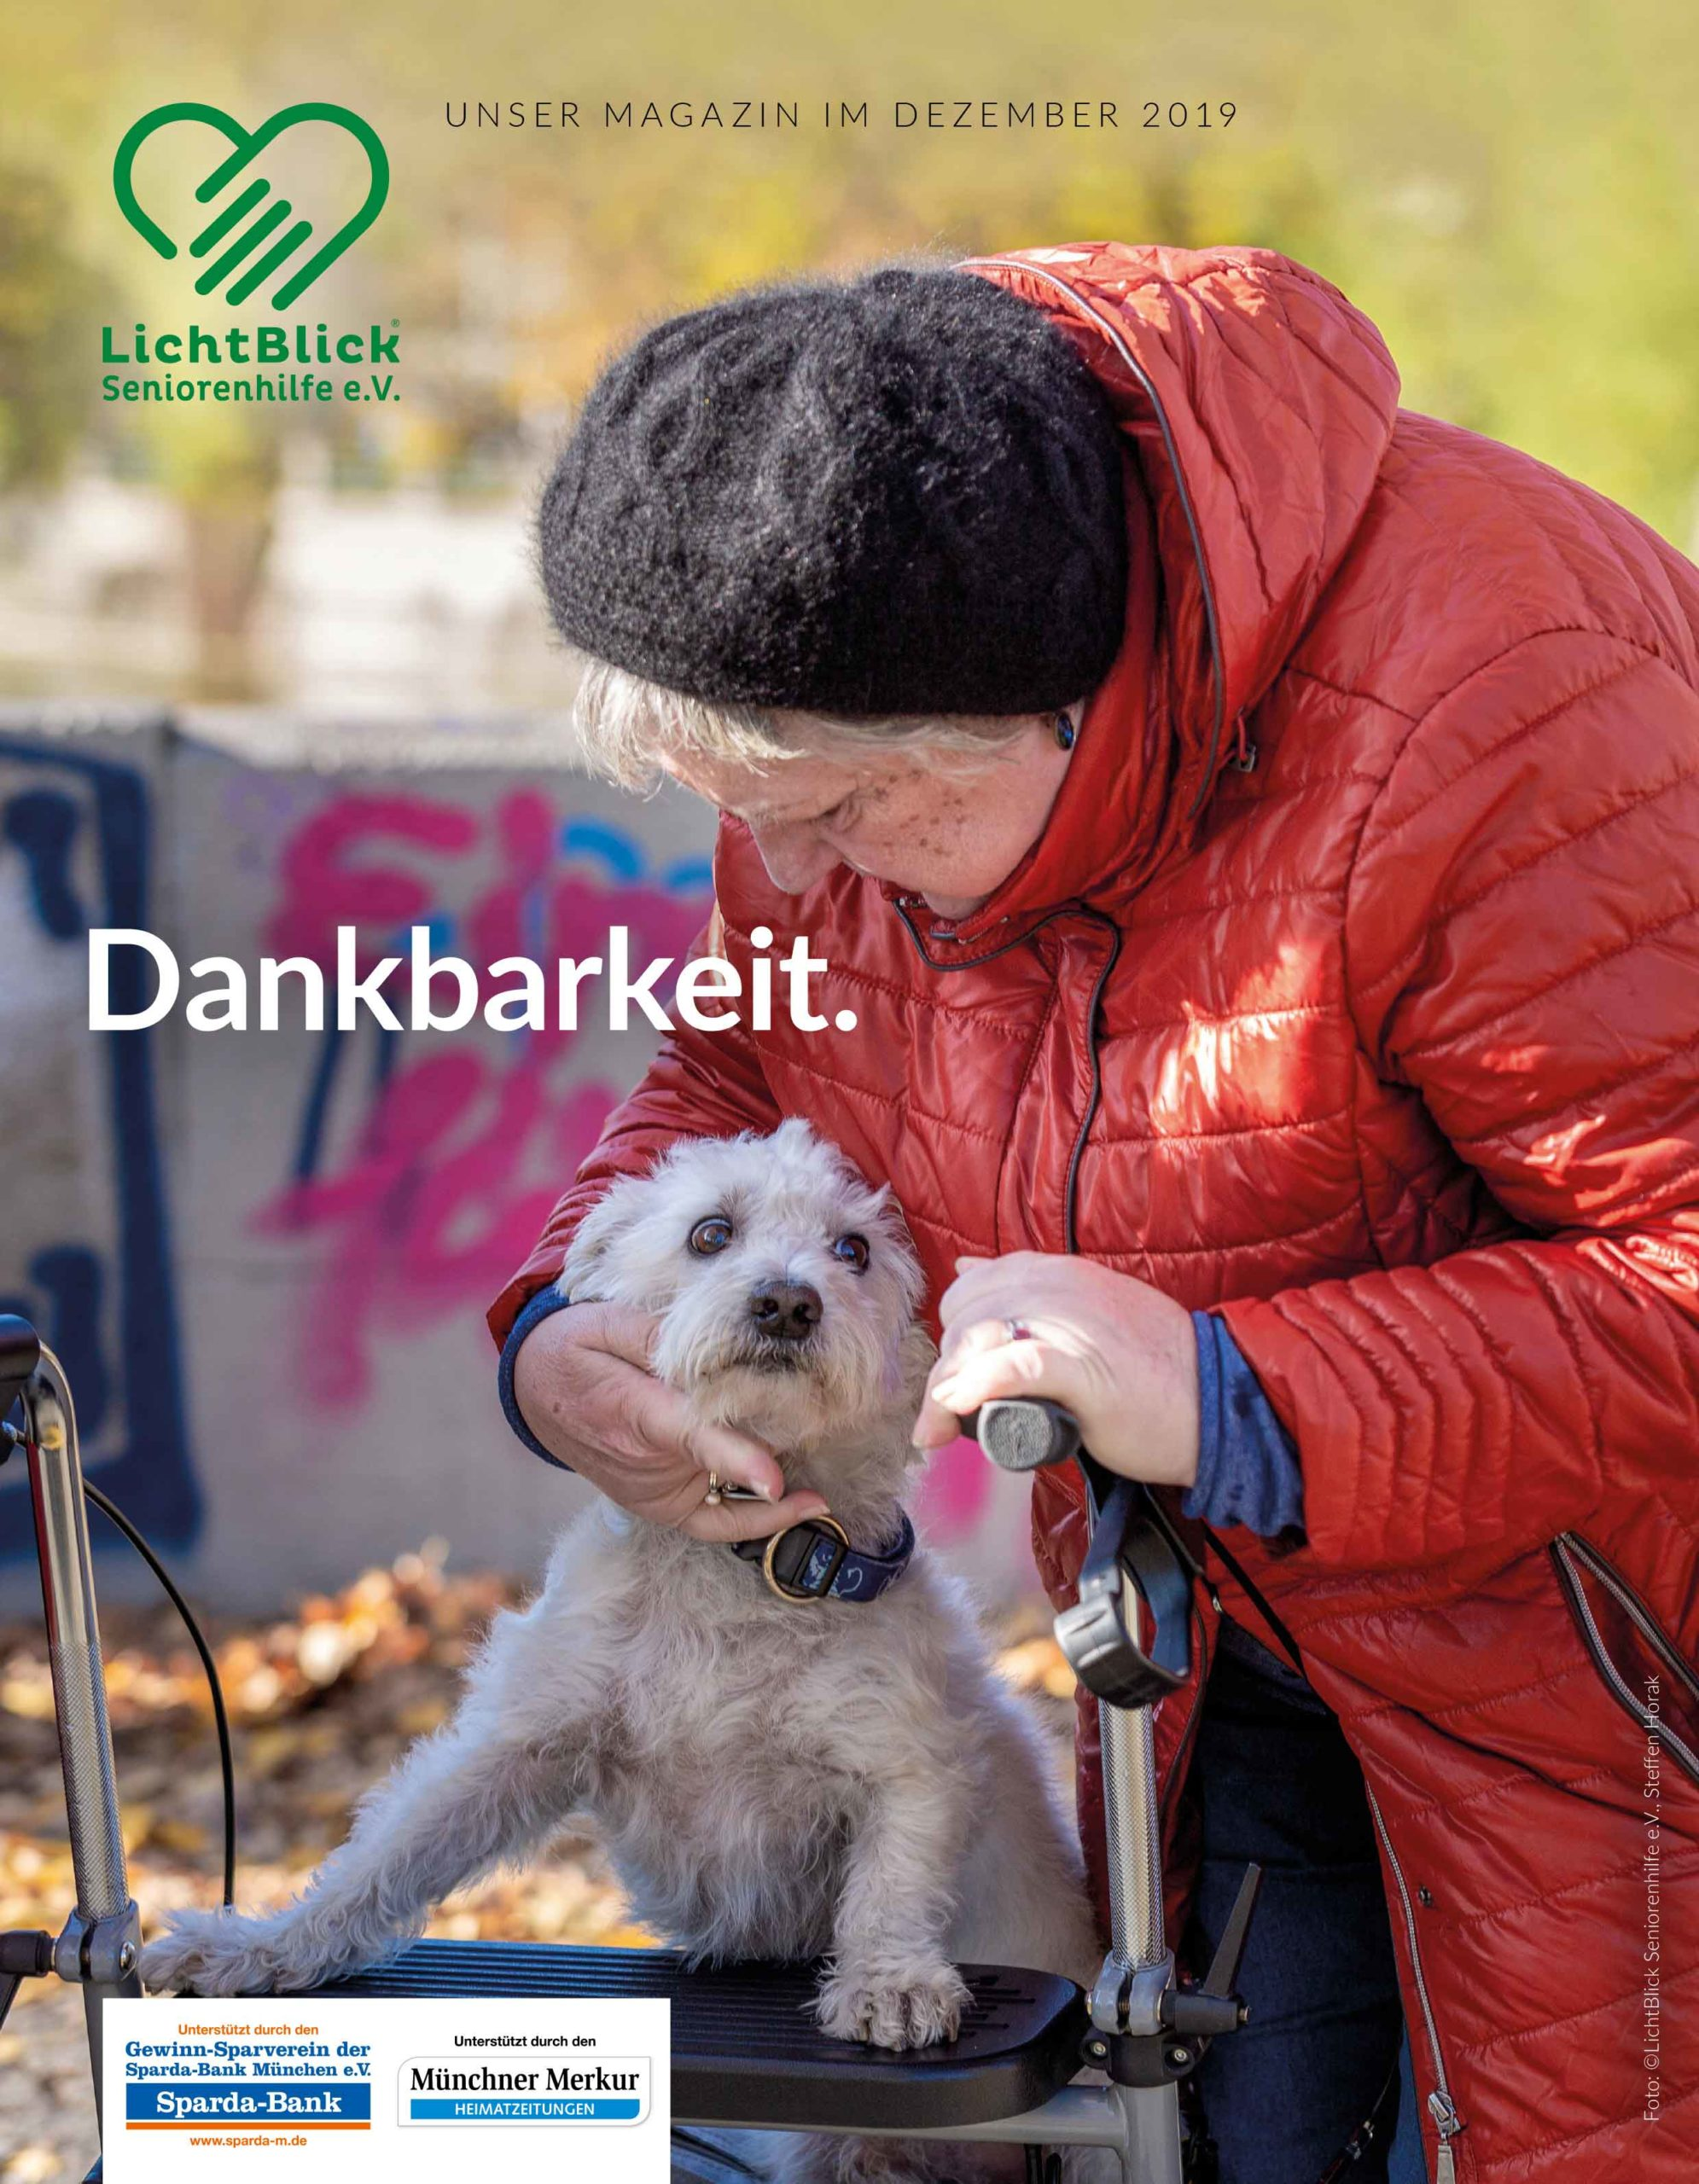 lichtblick seniorenhilfe berlin